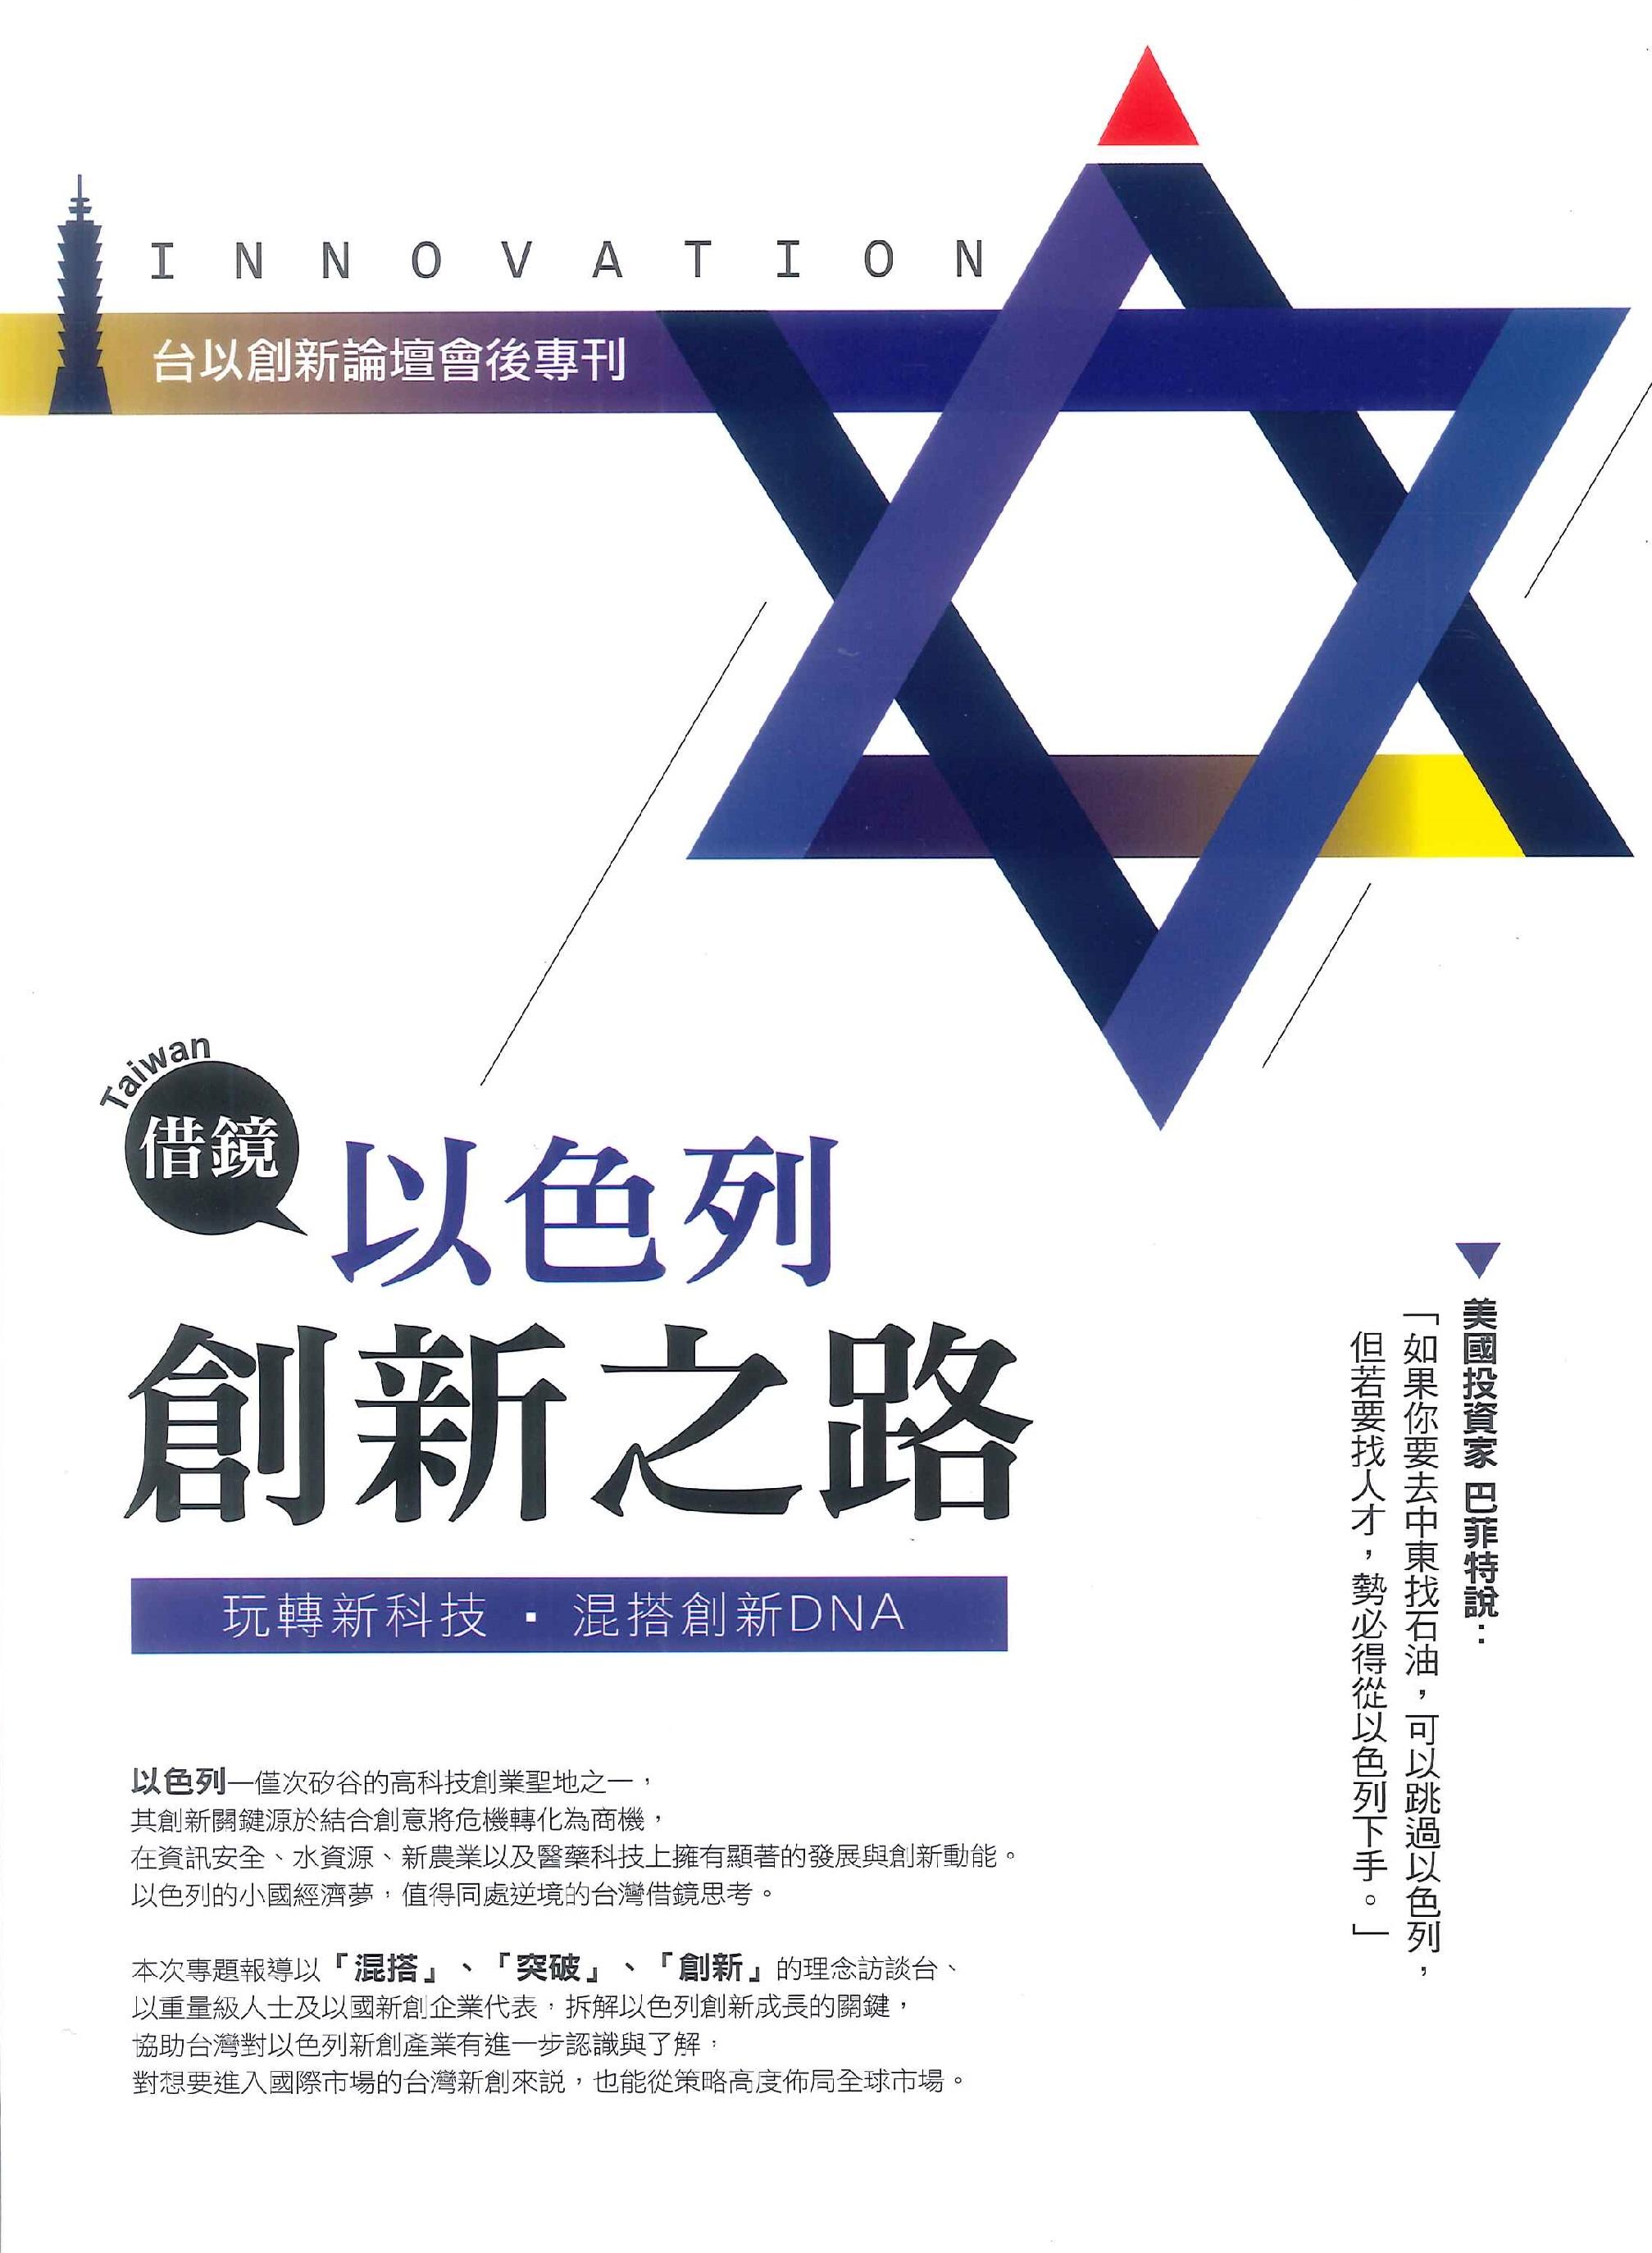 Taiwan借鏡以色列創新之路:玩轉新科技.混搭創新DNA